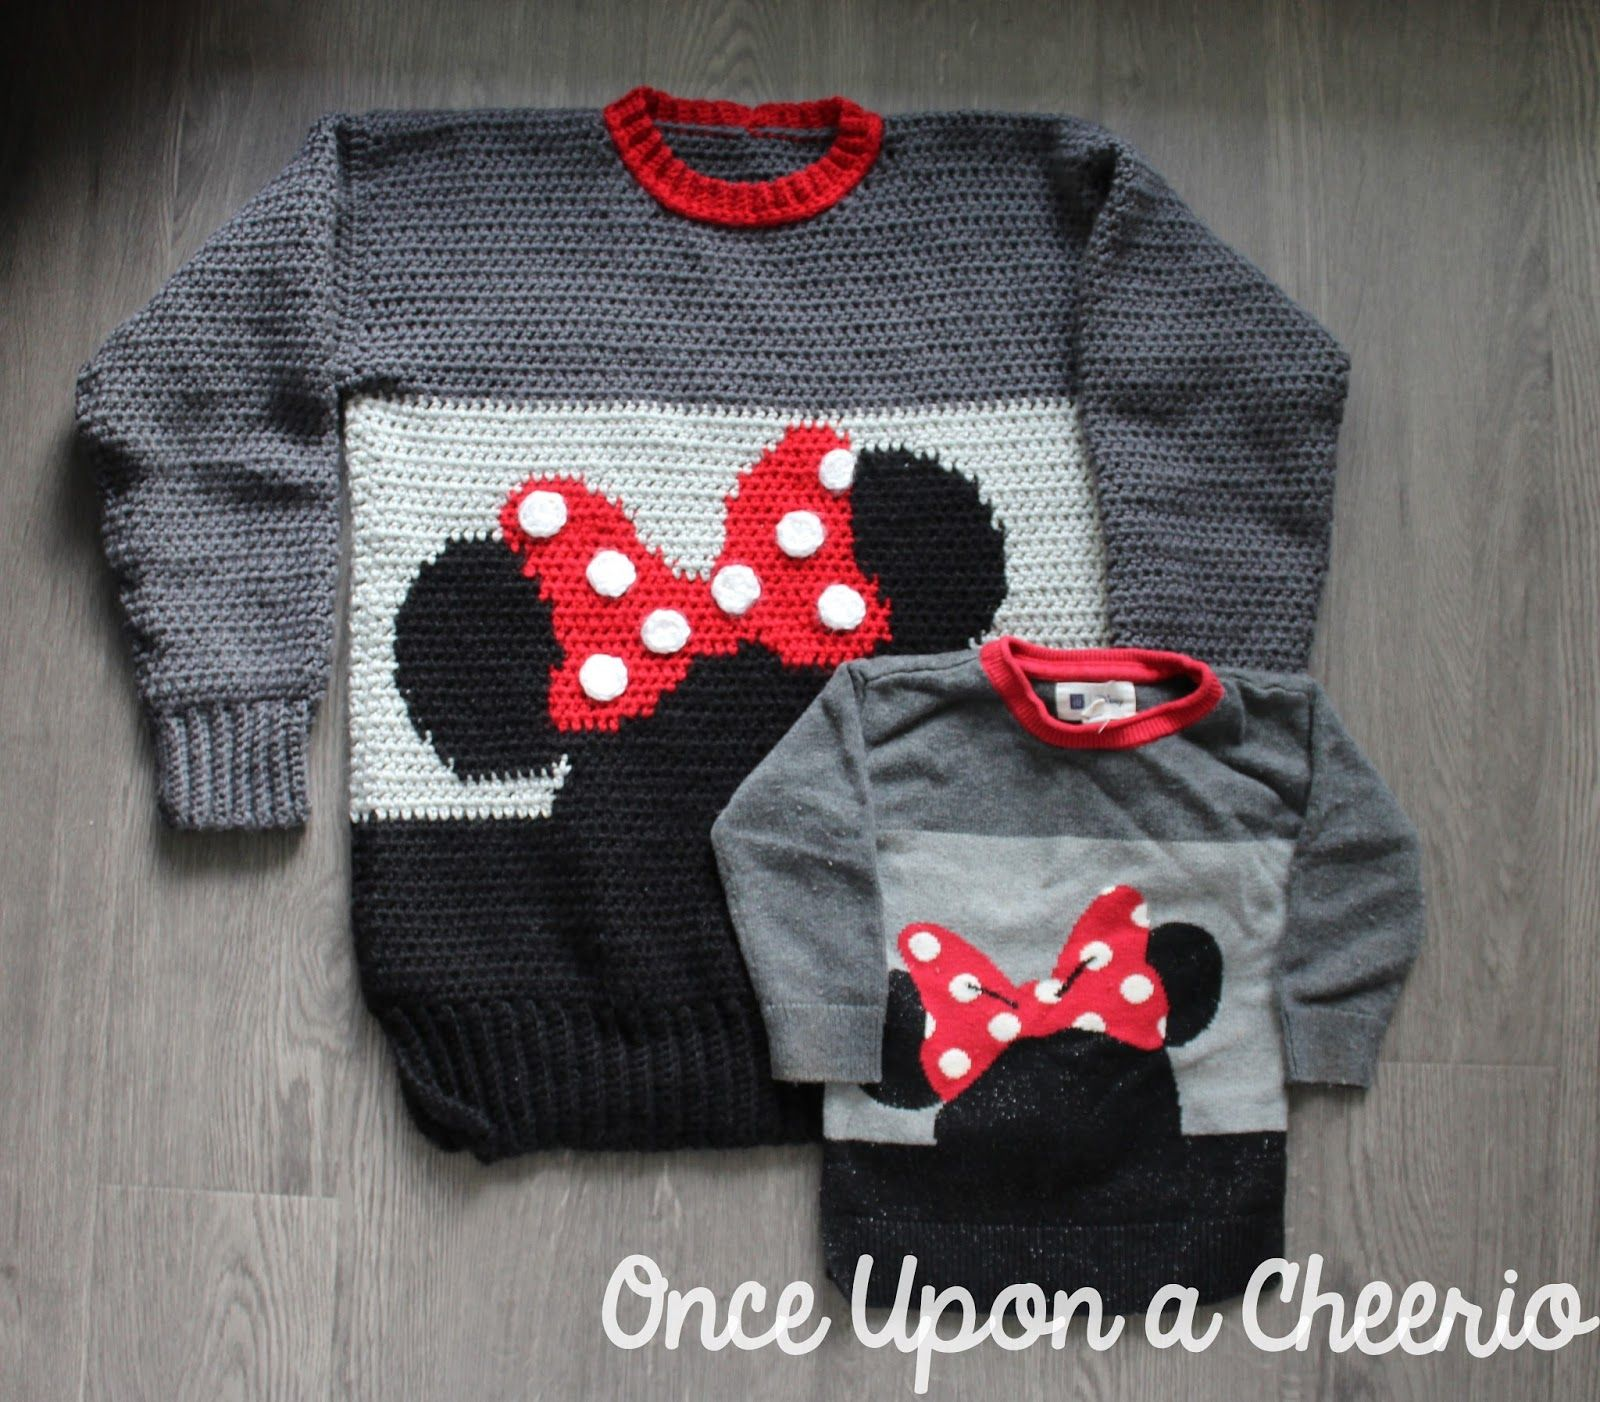 Minnie Mouse Sweater Crochet Pattern | Buzo, Patrones y Tejido